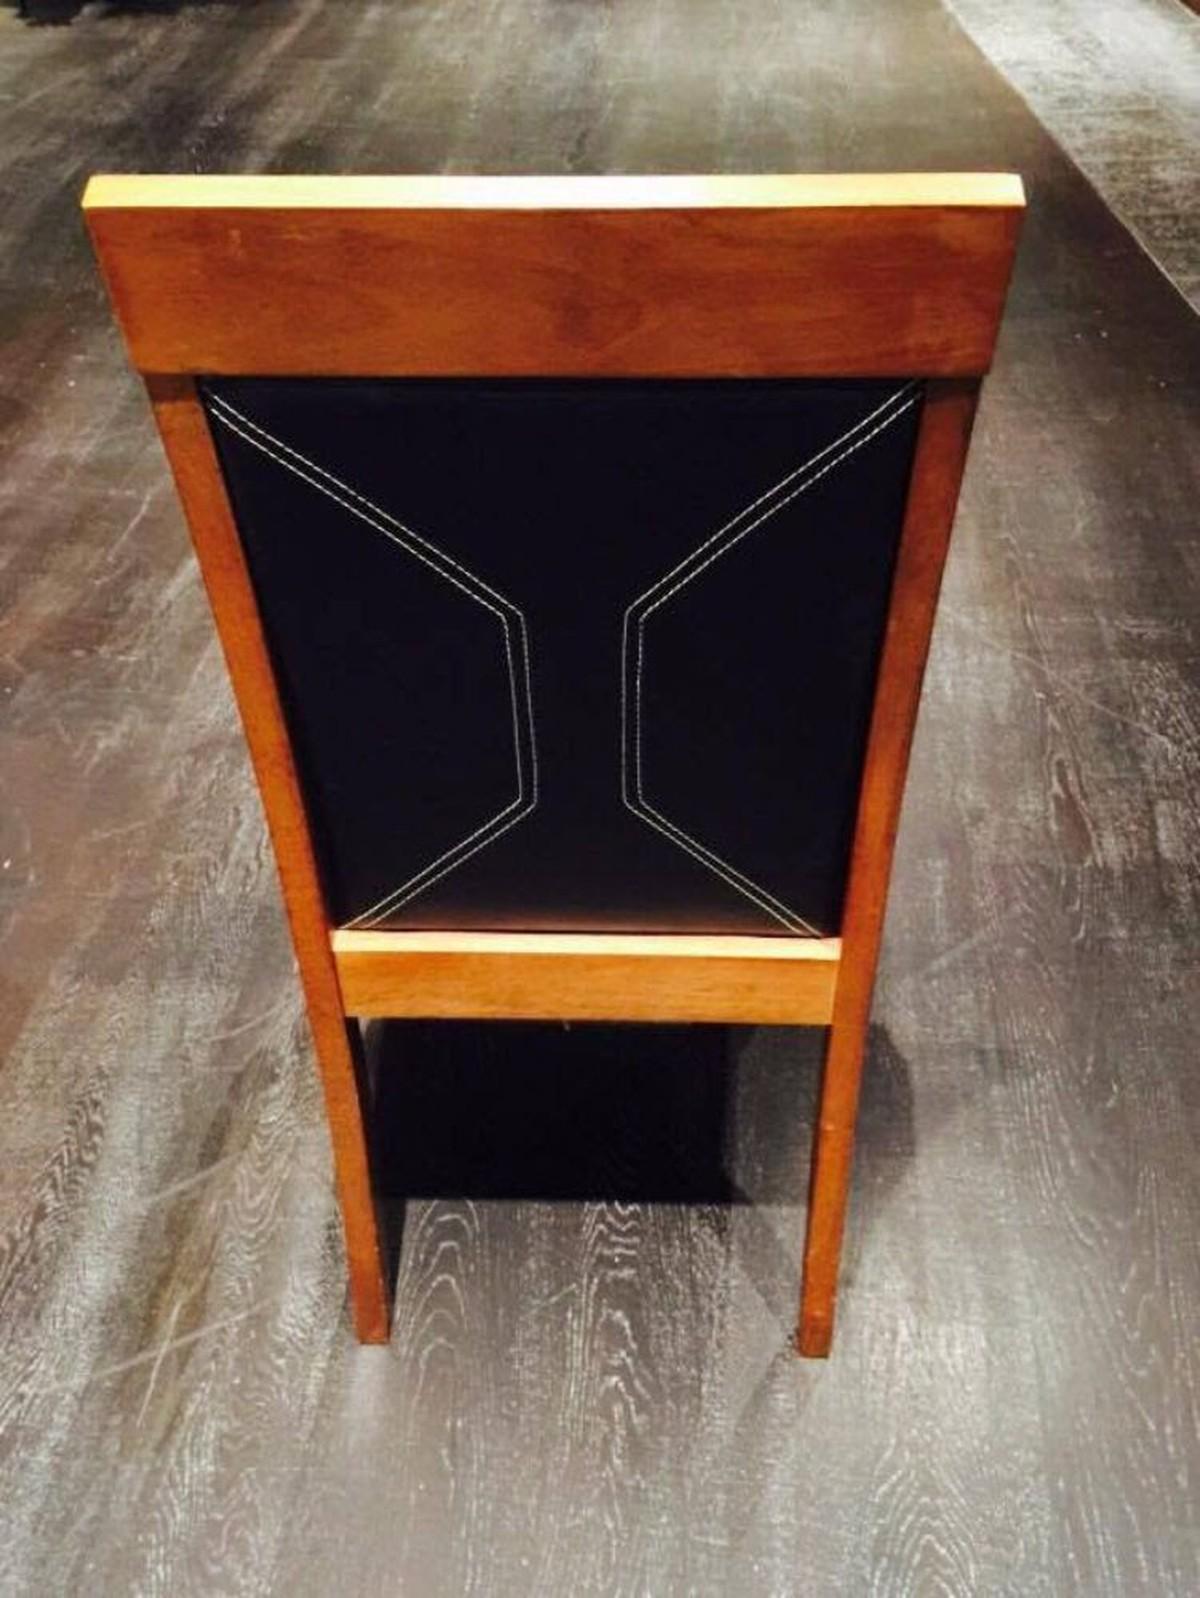 Secondhand hotel furniture restaurant chairs